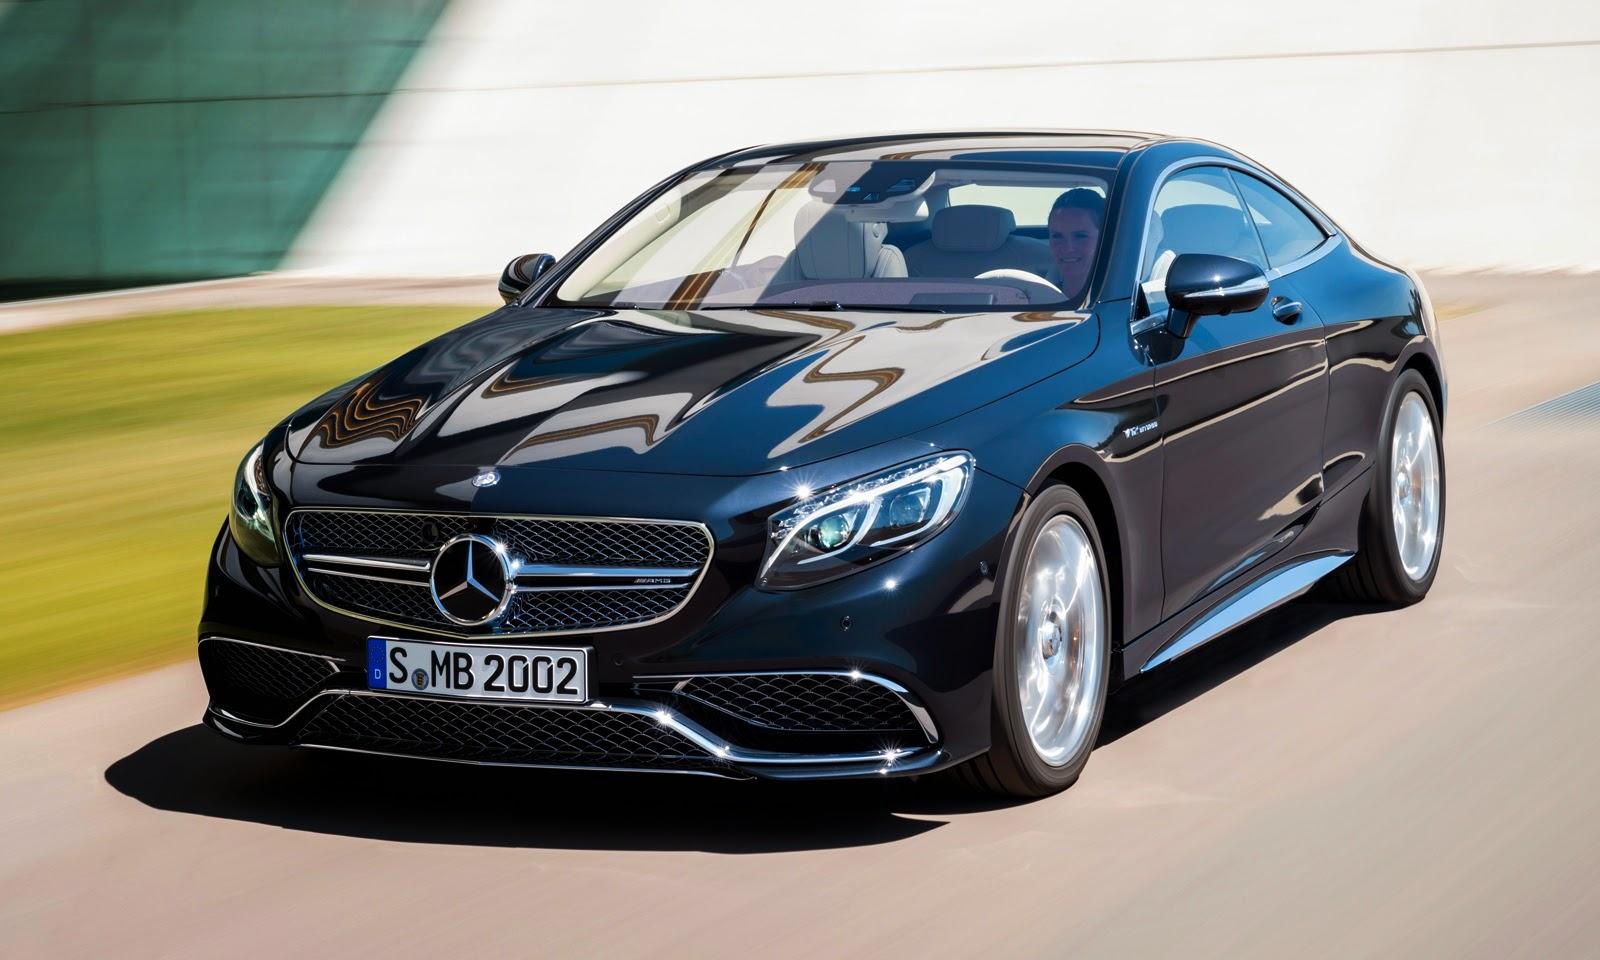 Bmotorweb papel de parede mercedes benz s65 amg coupe 2015 for Mercedes benz amg s65